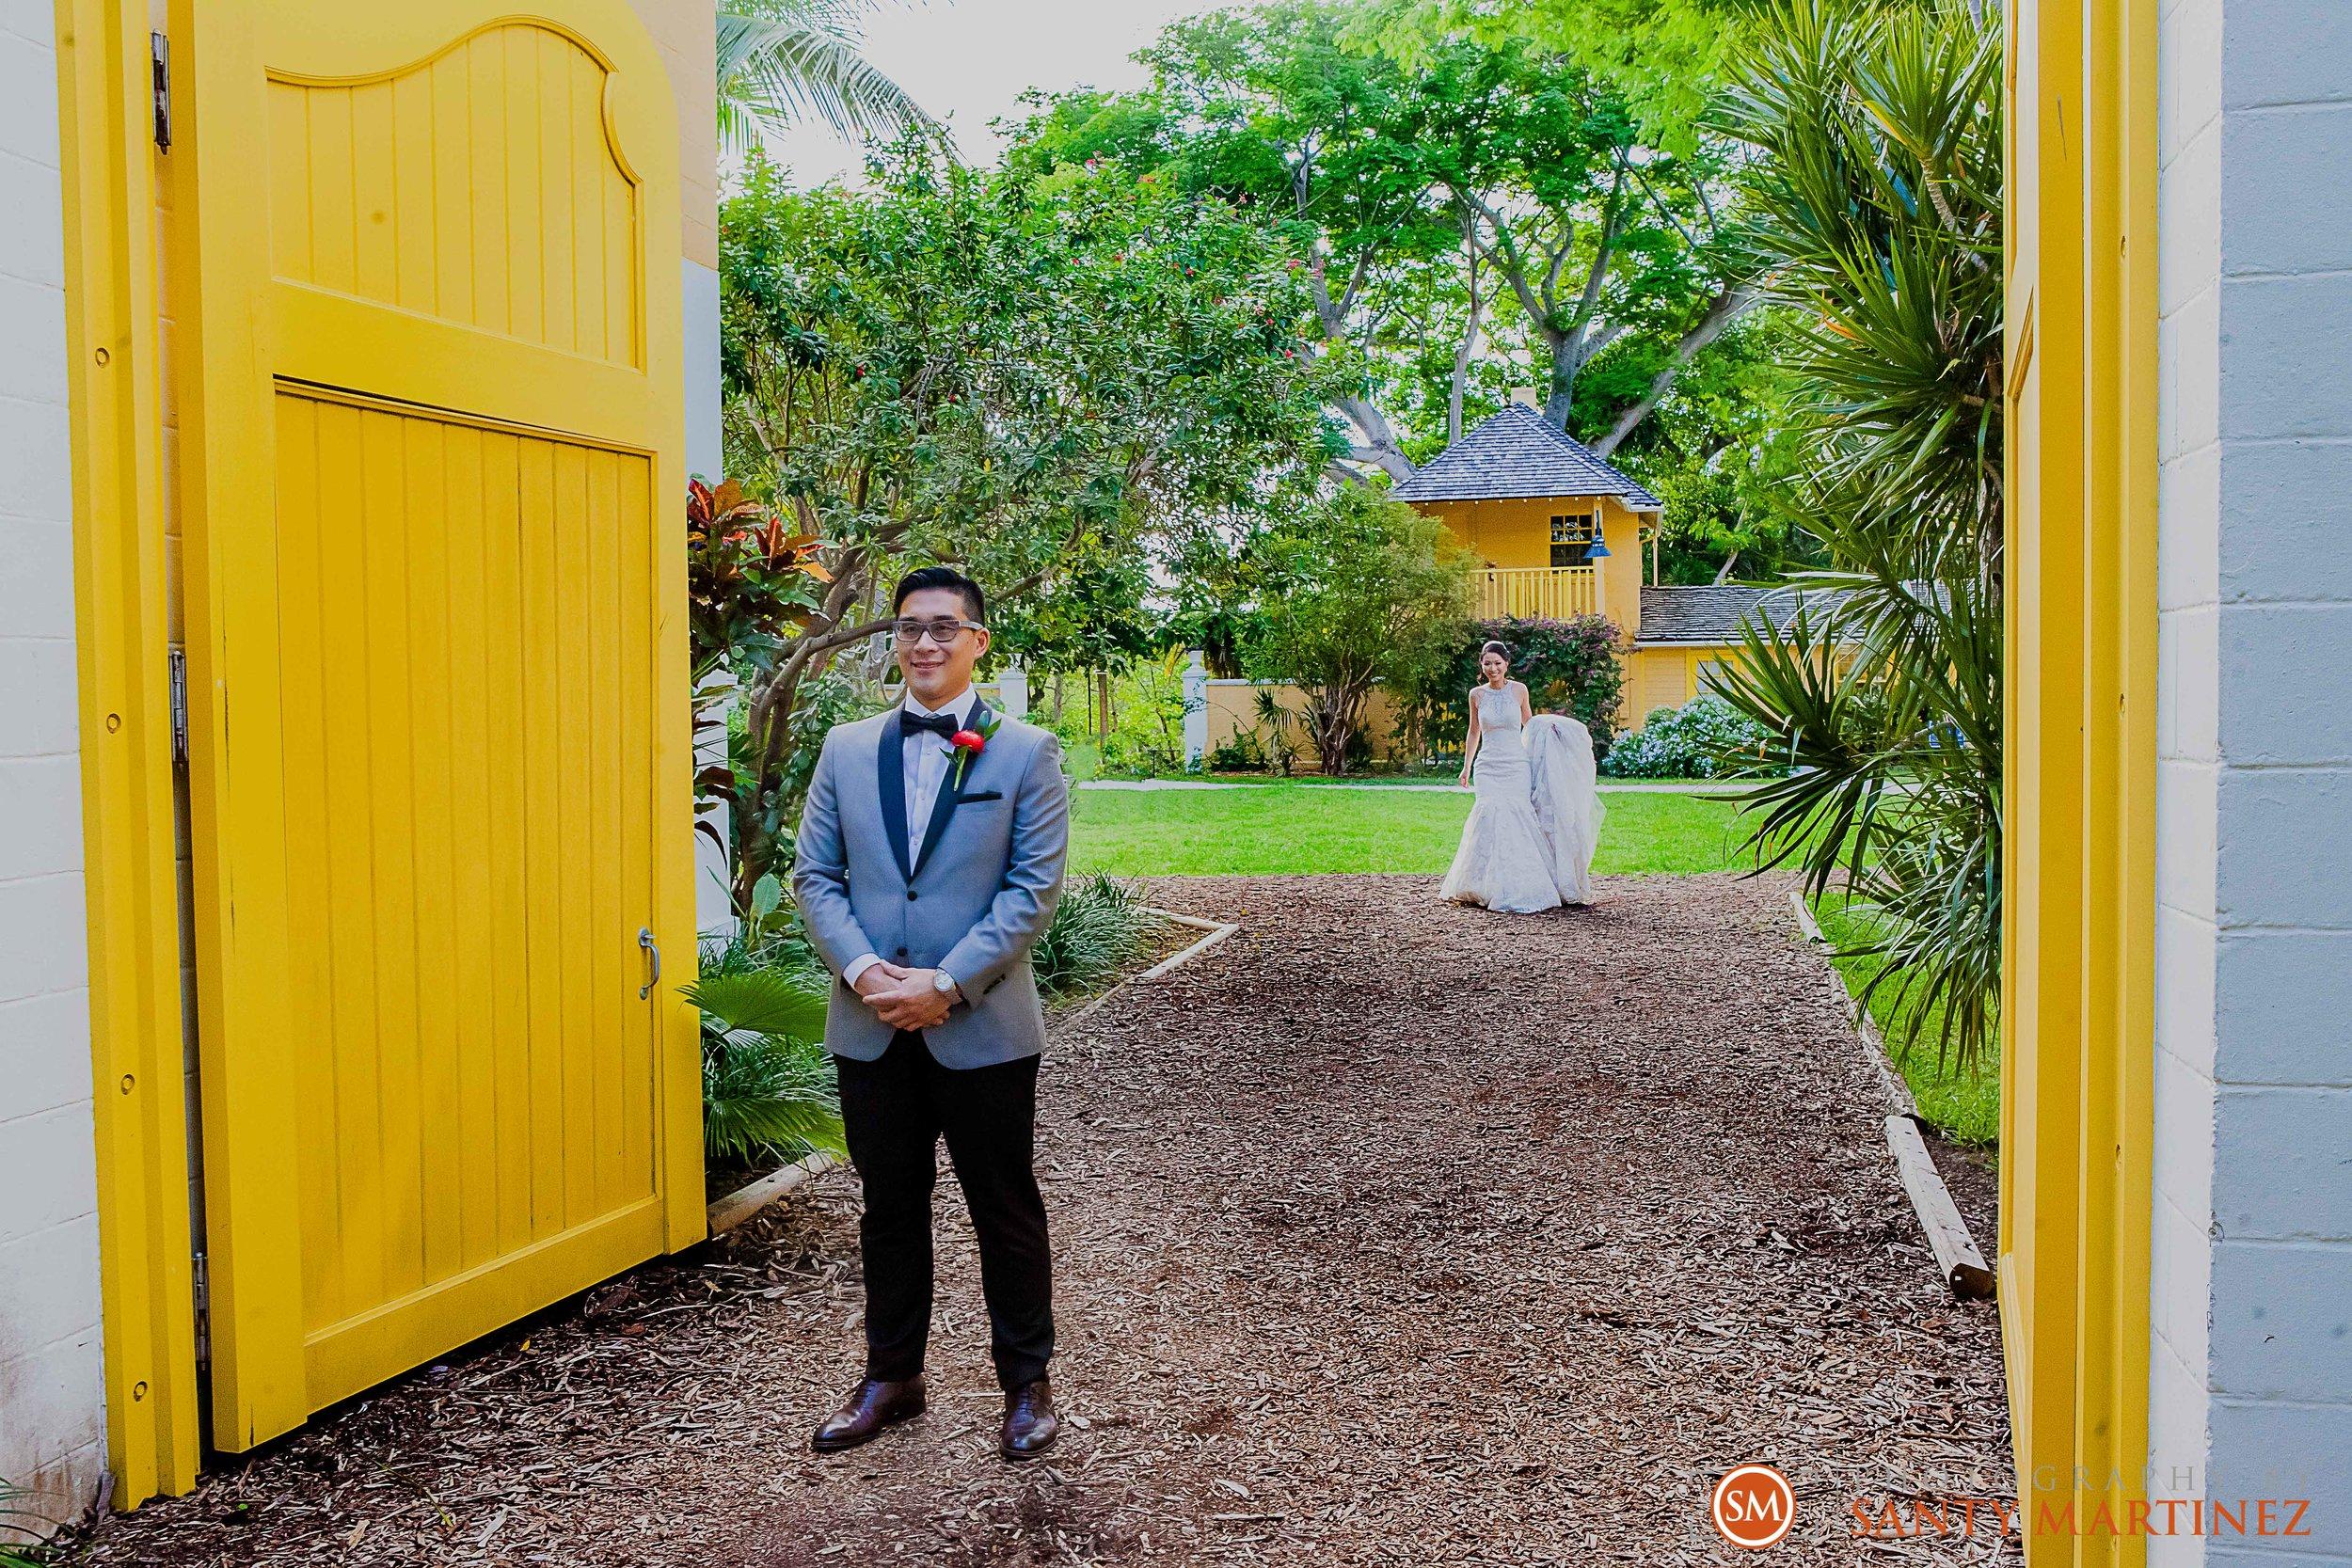 Wedding Bonnet House - Photography by Santy Martinez-9.jpg